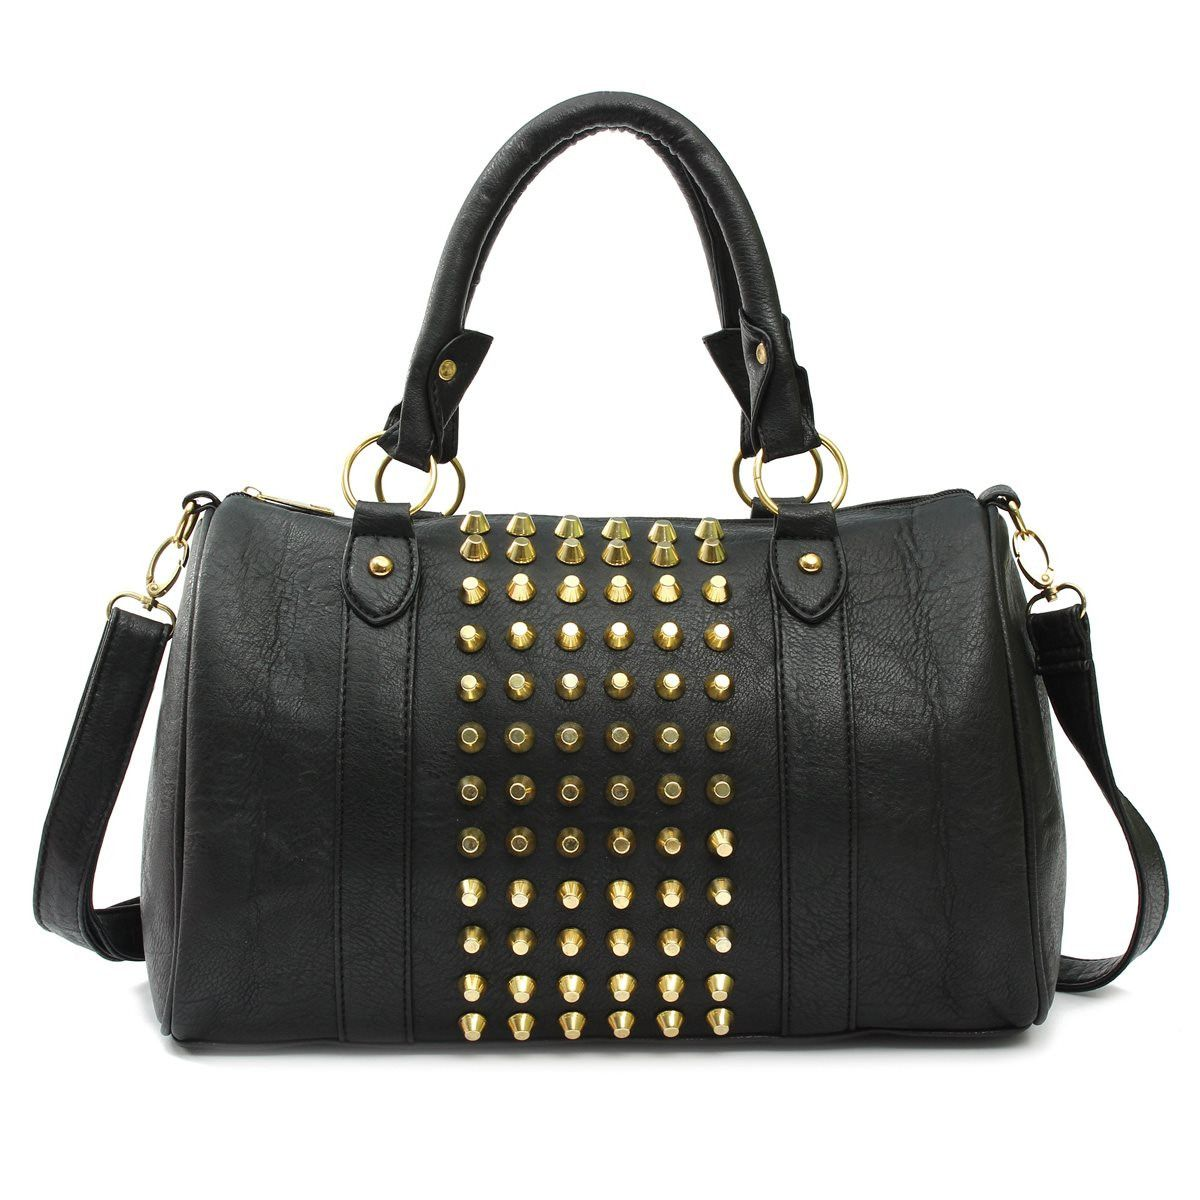 Casual Fashion Women PU Leather Dual Use Bucket Handbags Crossbody Rivet  Ladies Buckle Tote Motorcycle Large eaa4248a9cf58